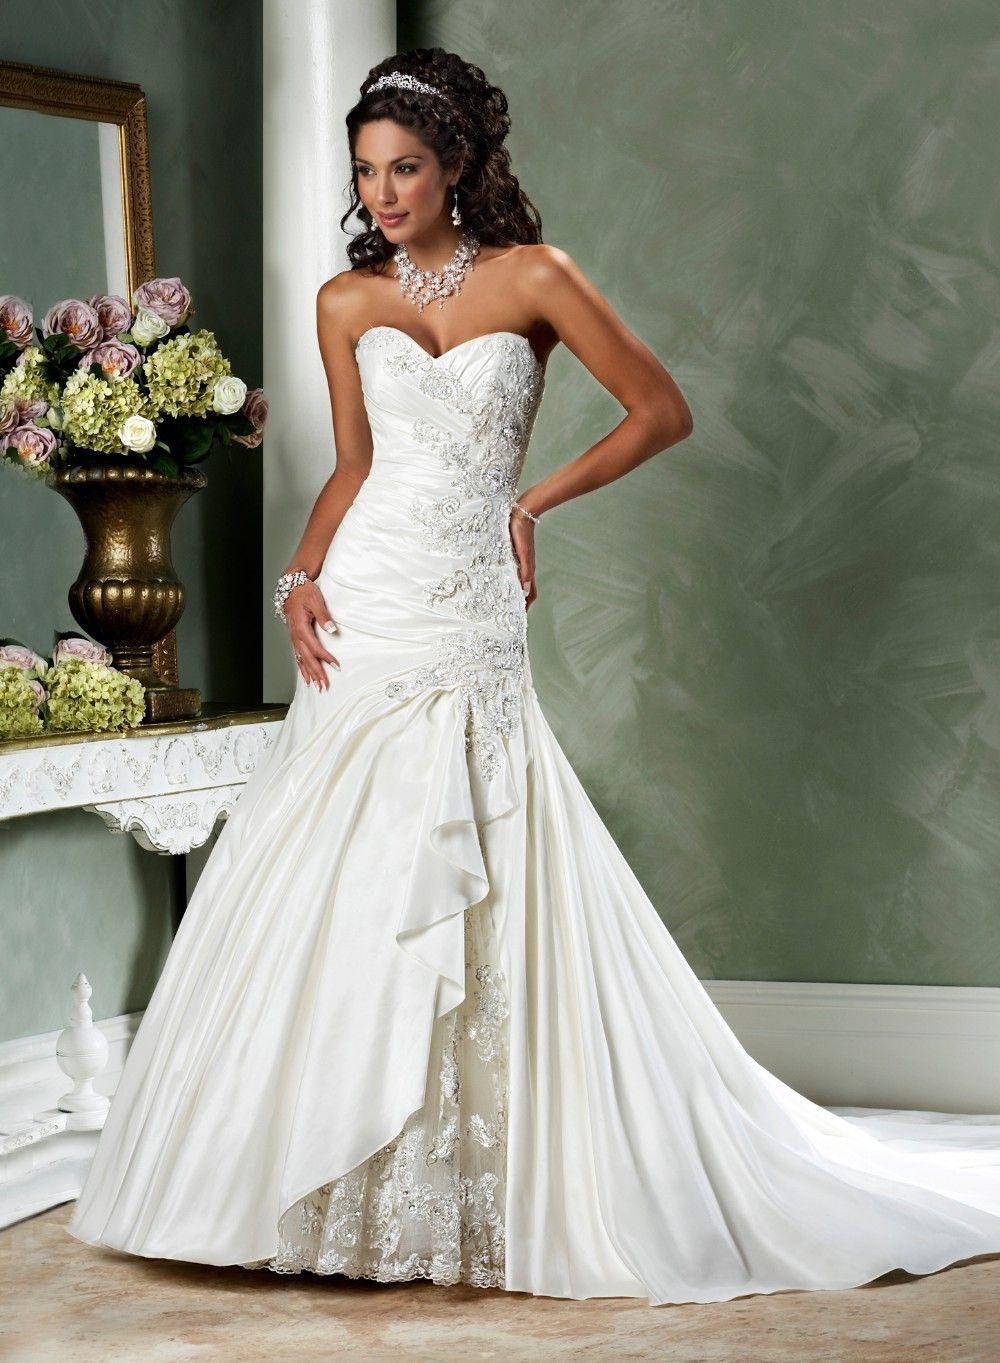 Lace spanish designer wedding dresses 2014 designer bridesmaid lace spanish designer wedding dresses 2014 ombrellifo Image collections